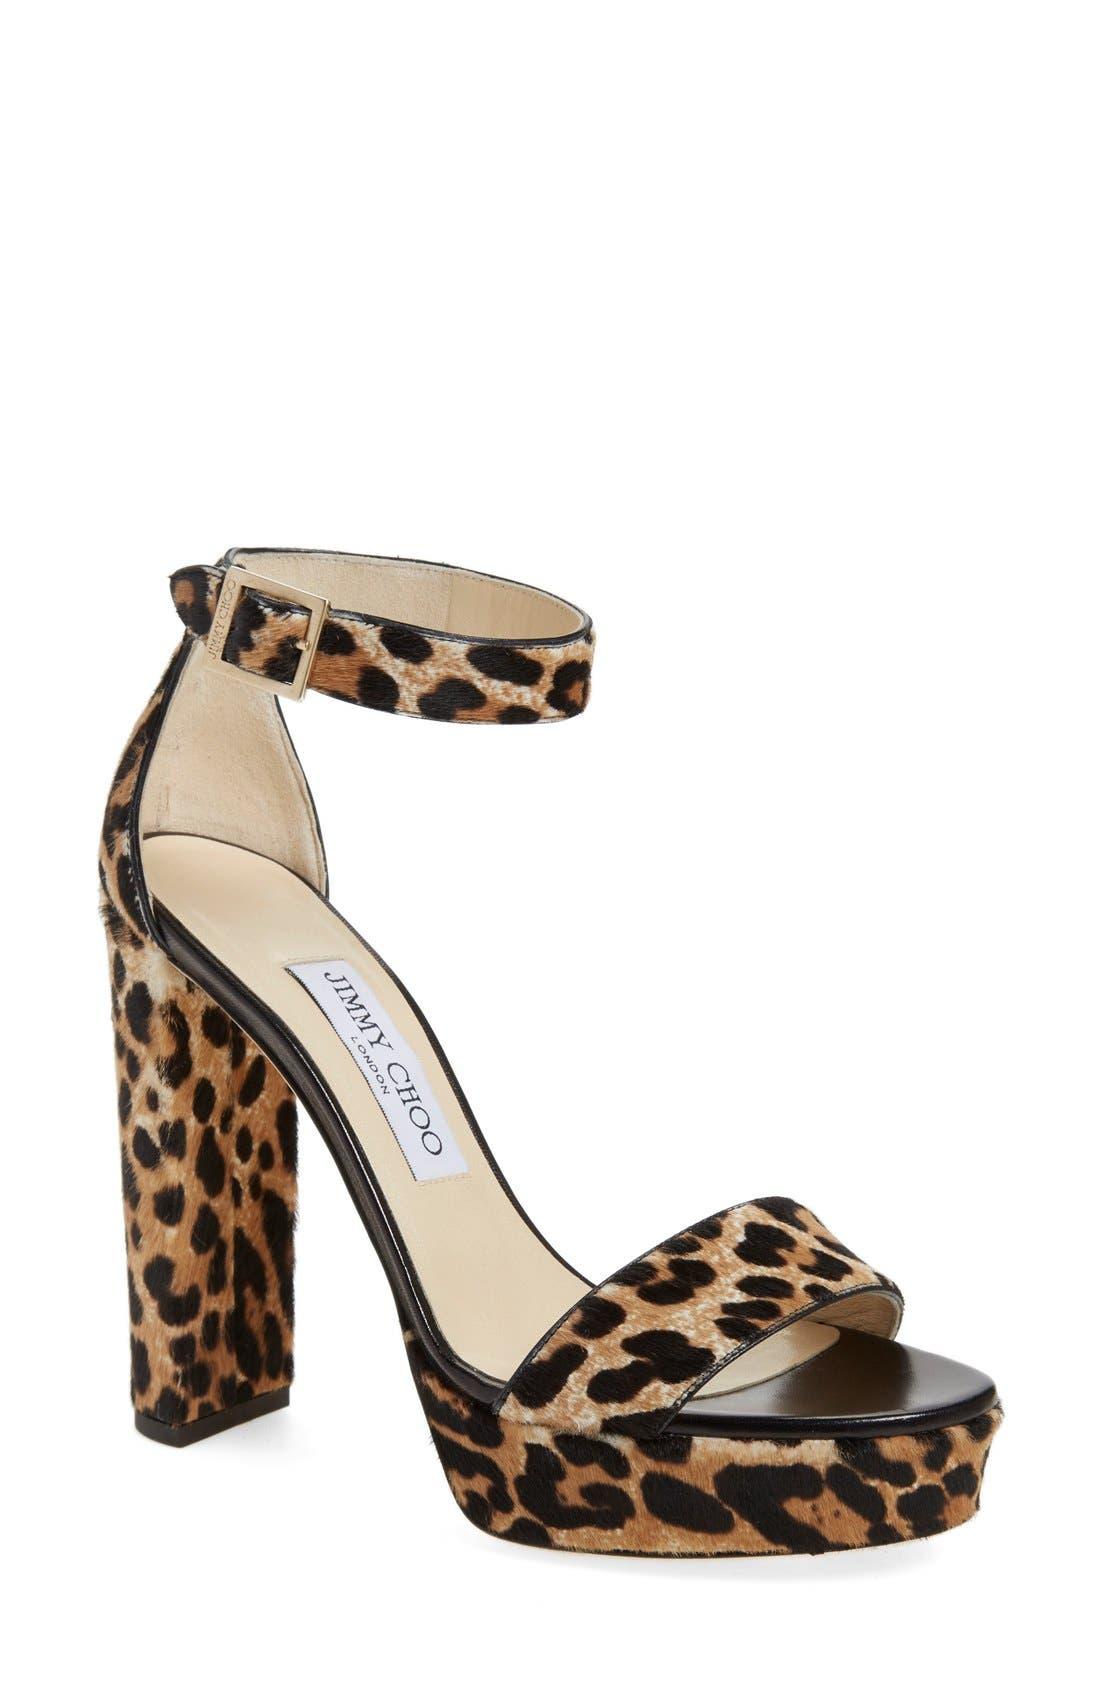 Main Image - Jimmy Choo 'Holly' Ankle Strap Sandal (Women)